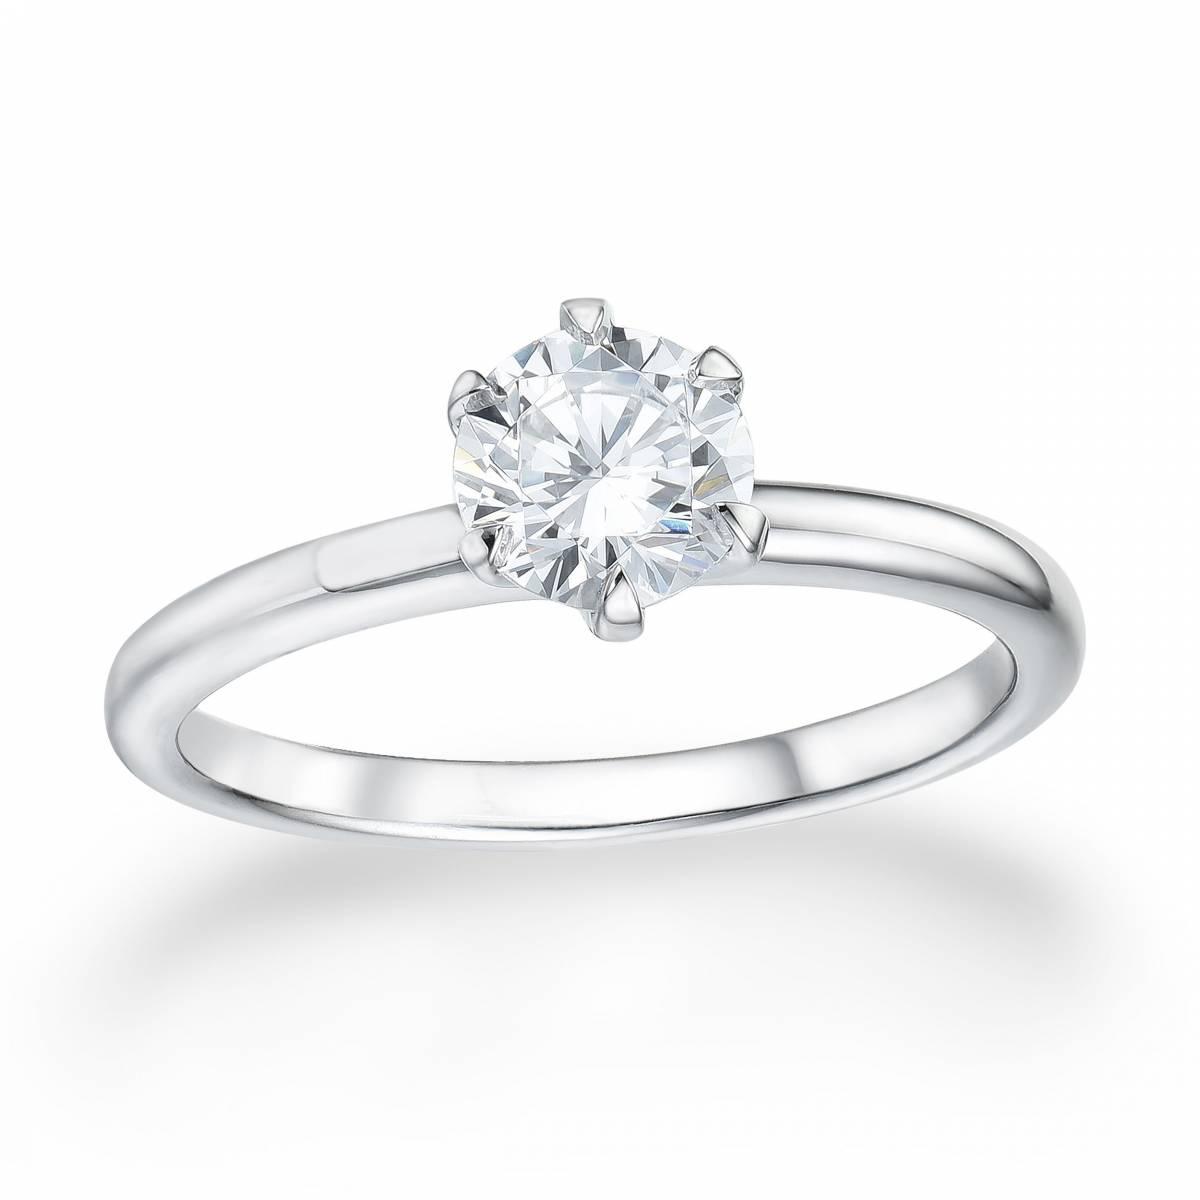 Gilson - Juwelen - Bruidsjuwelen - Trouwring - Verlovingsring - House of Weddings - 2